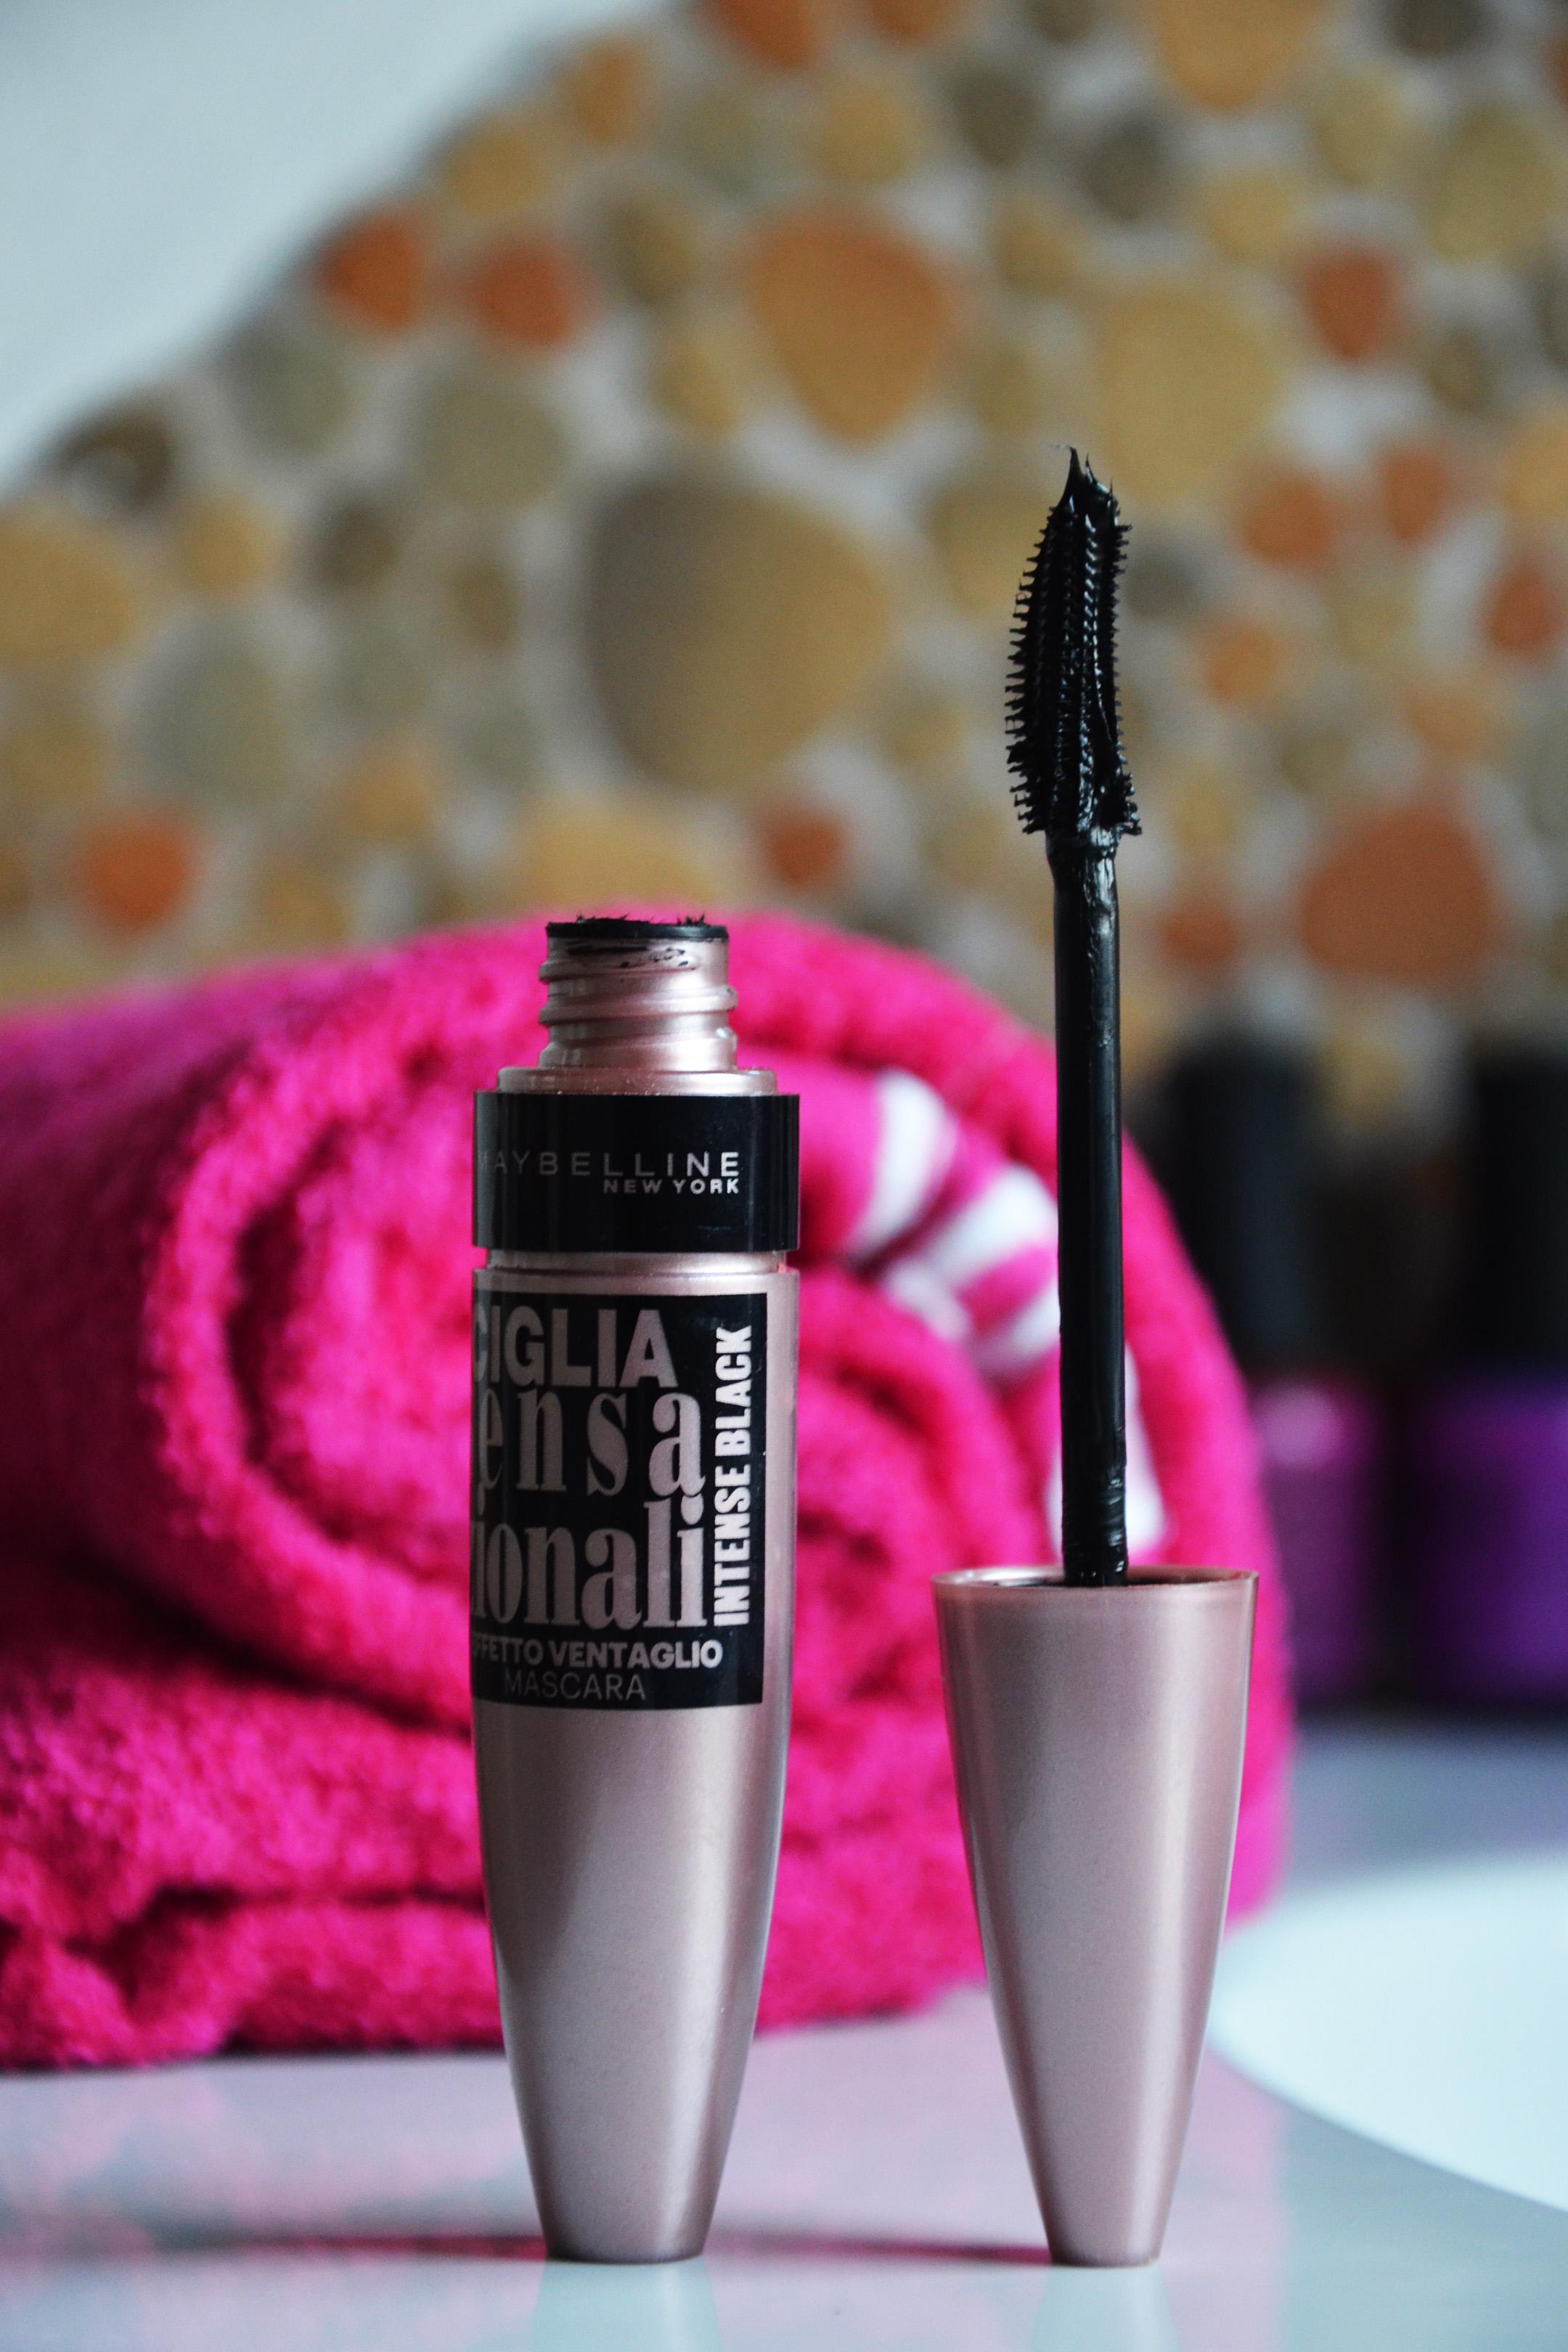 ciglia-sensational-maybelline-mascara-ciglia-folte-eyelashes